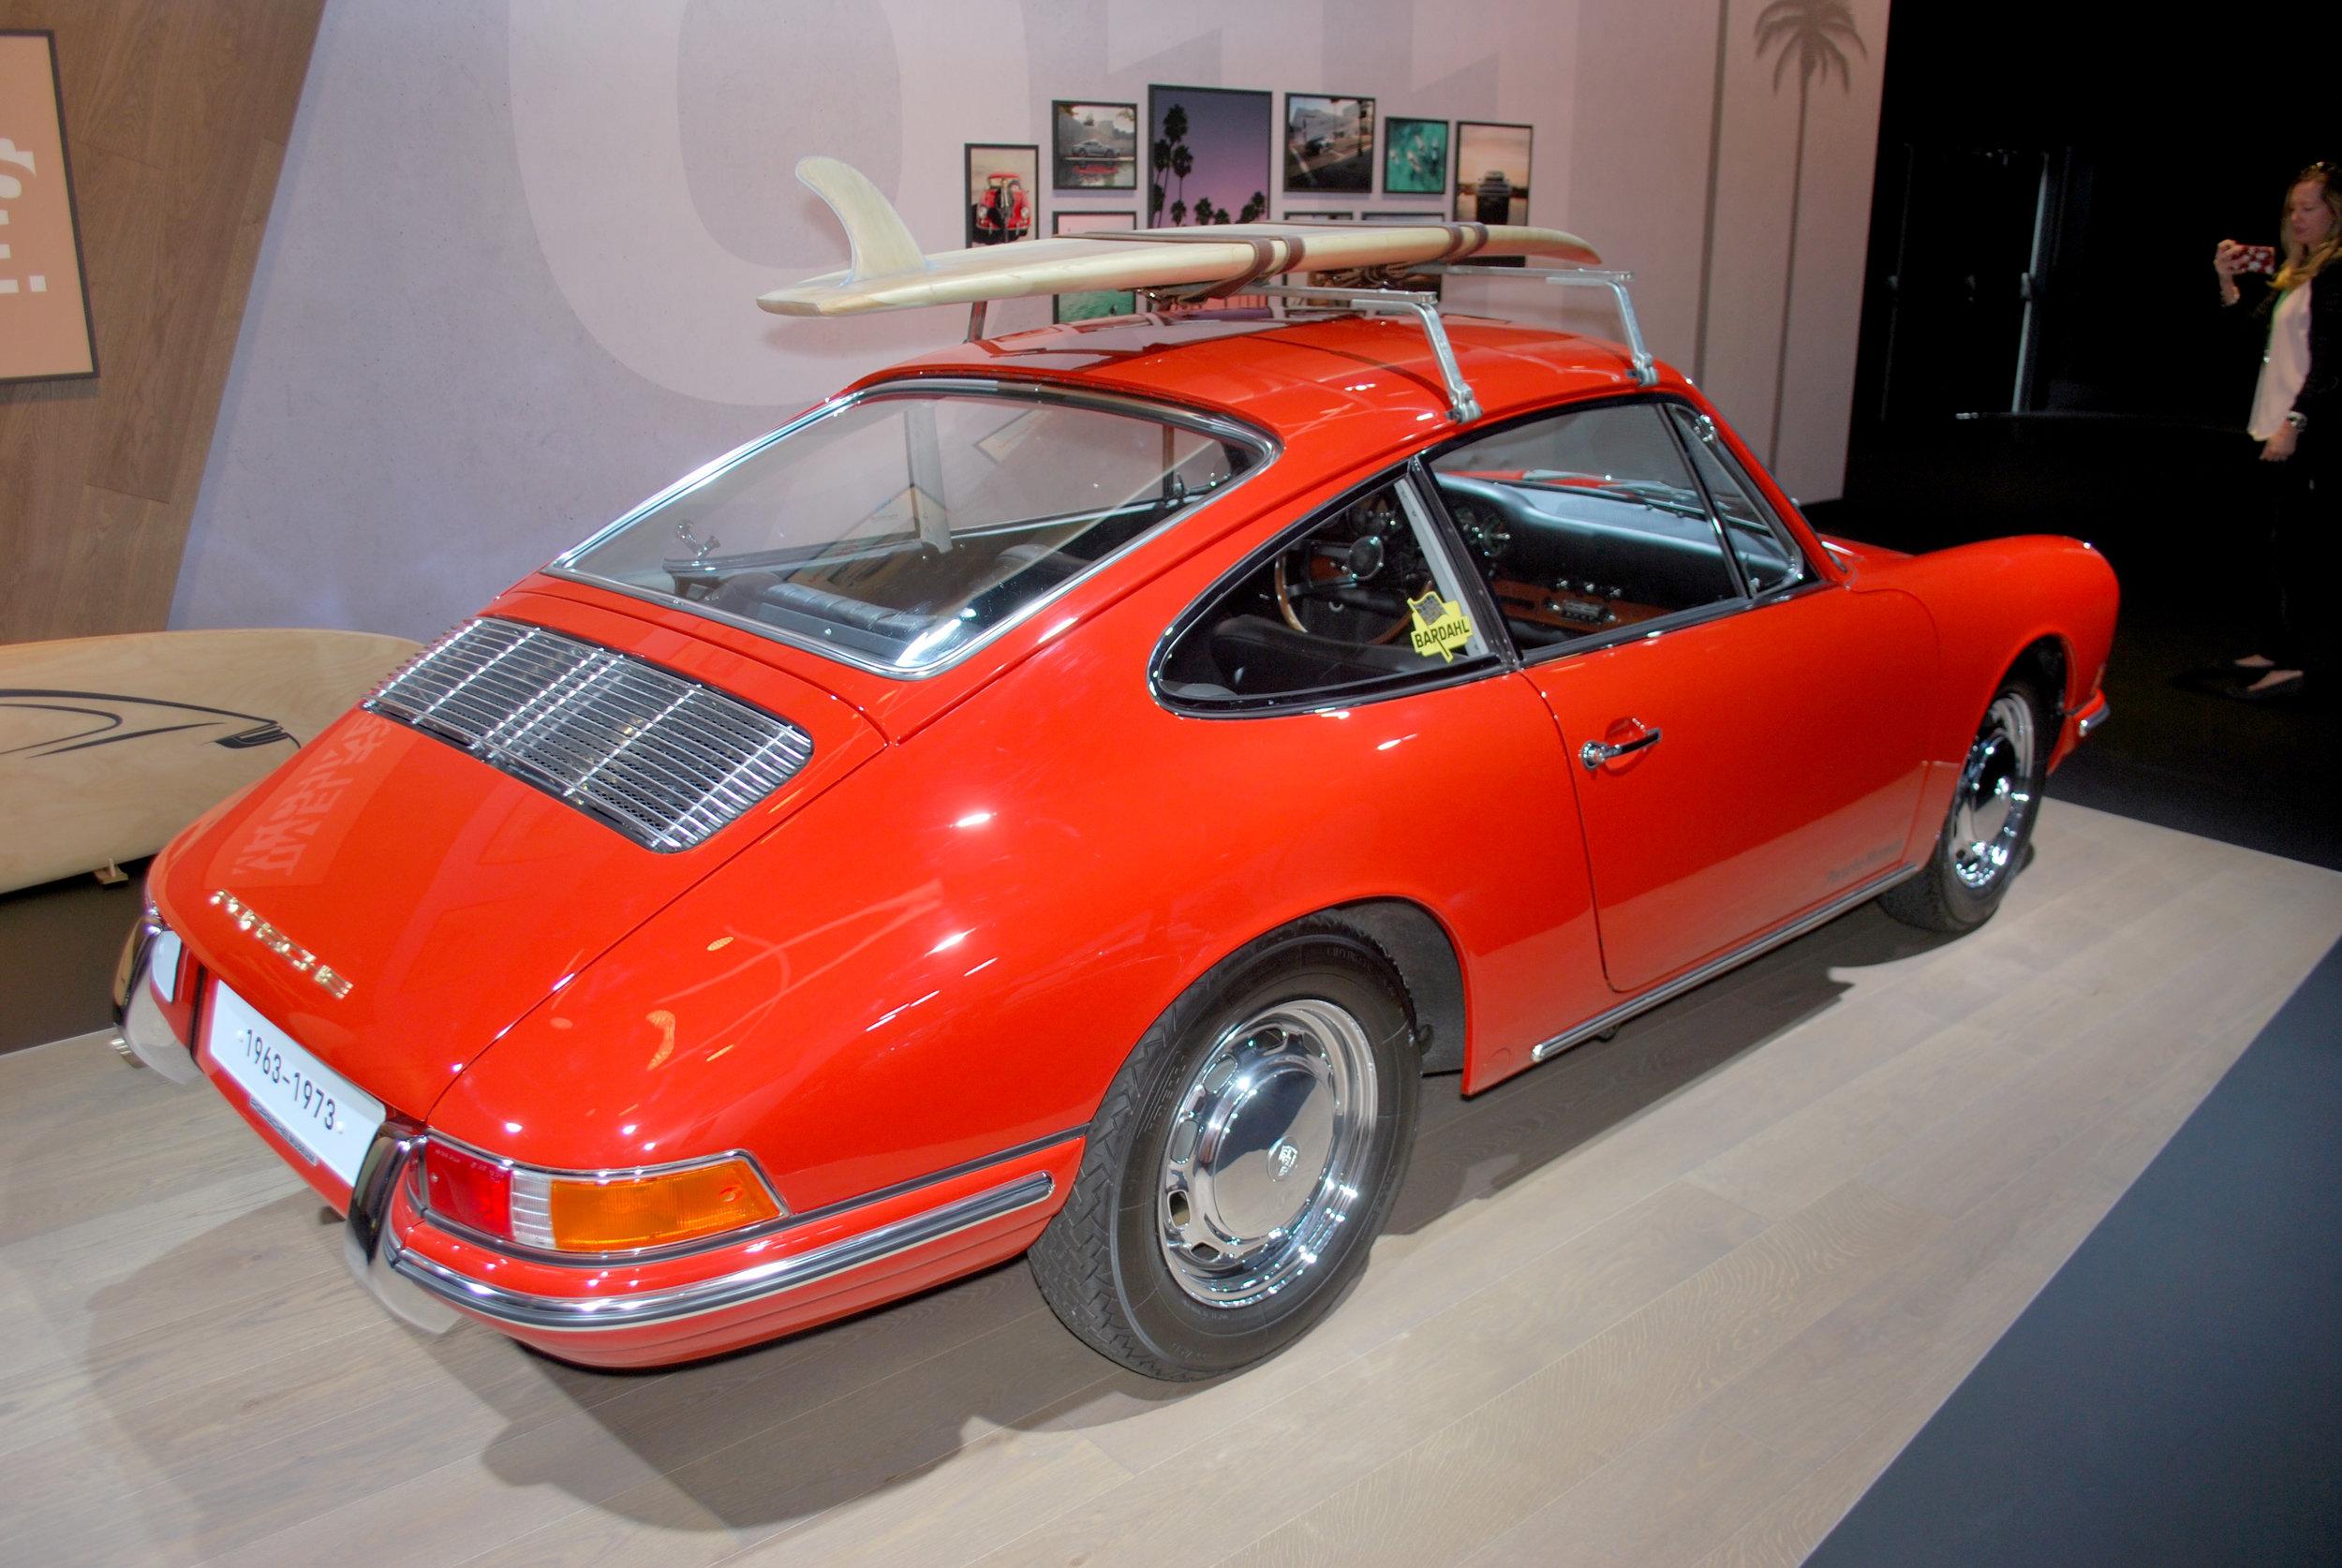 Original Porsche 911 at the 2018 Los Angeles International Auto